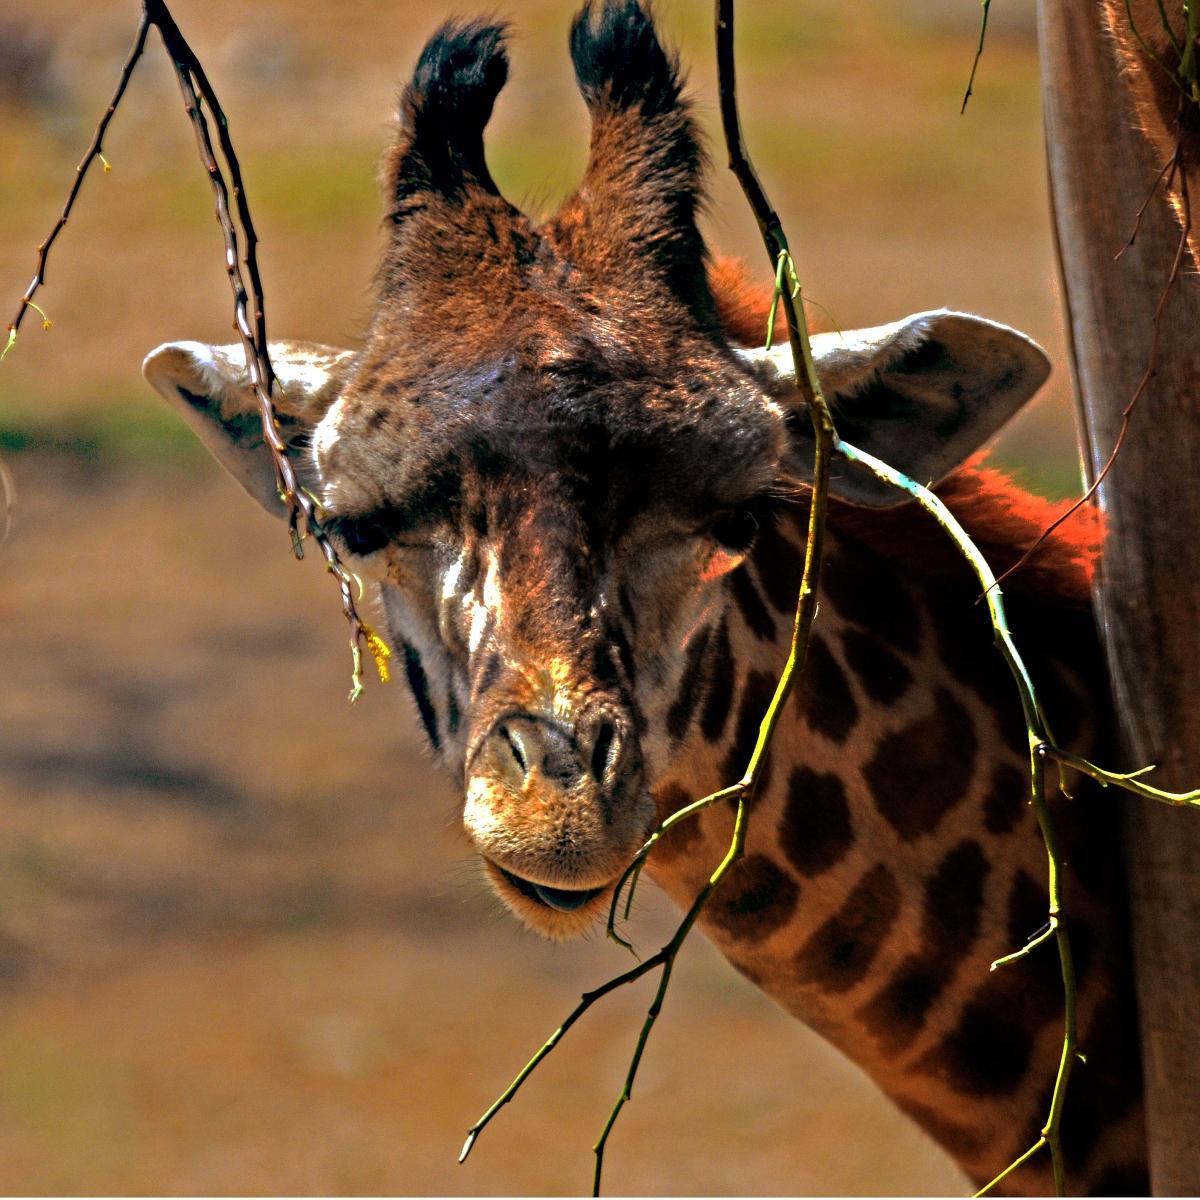 Giraffe Just Peeking